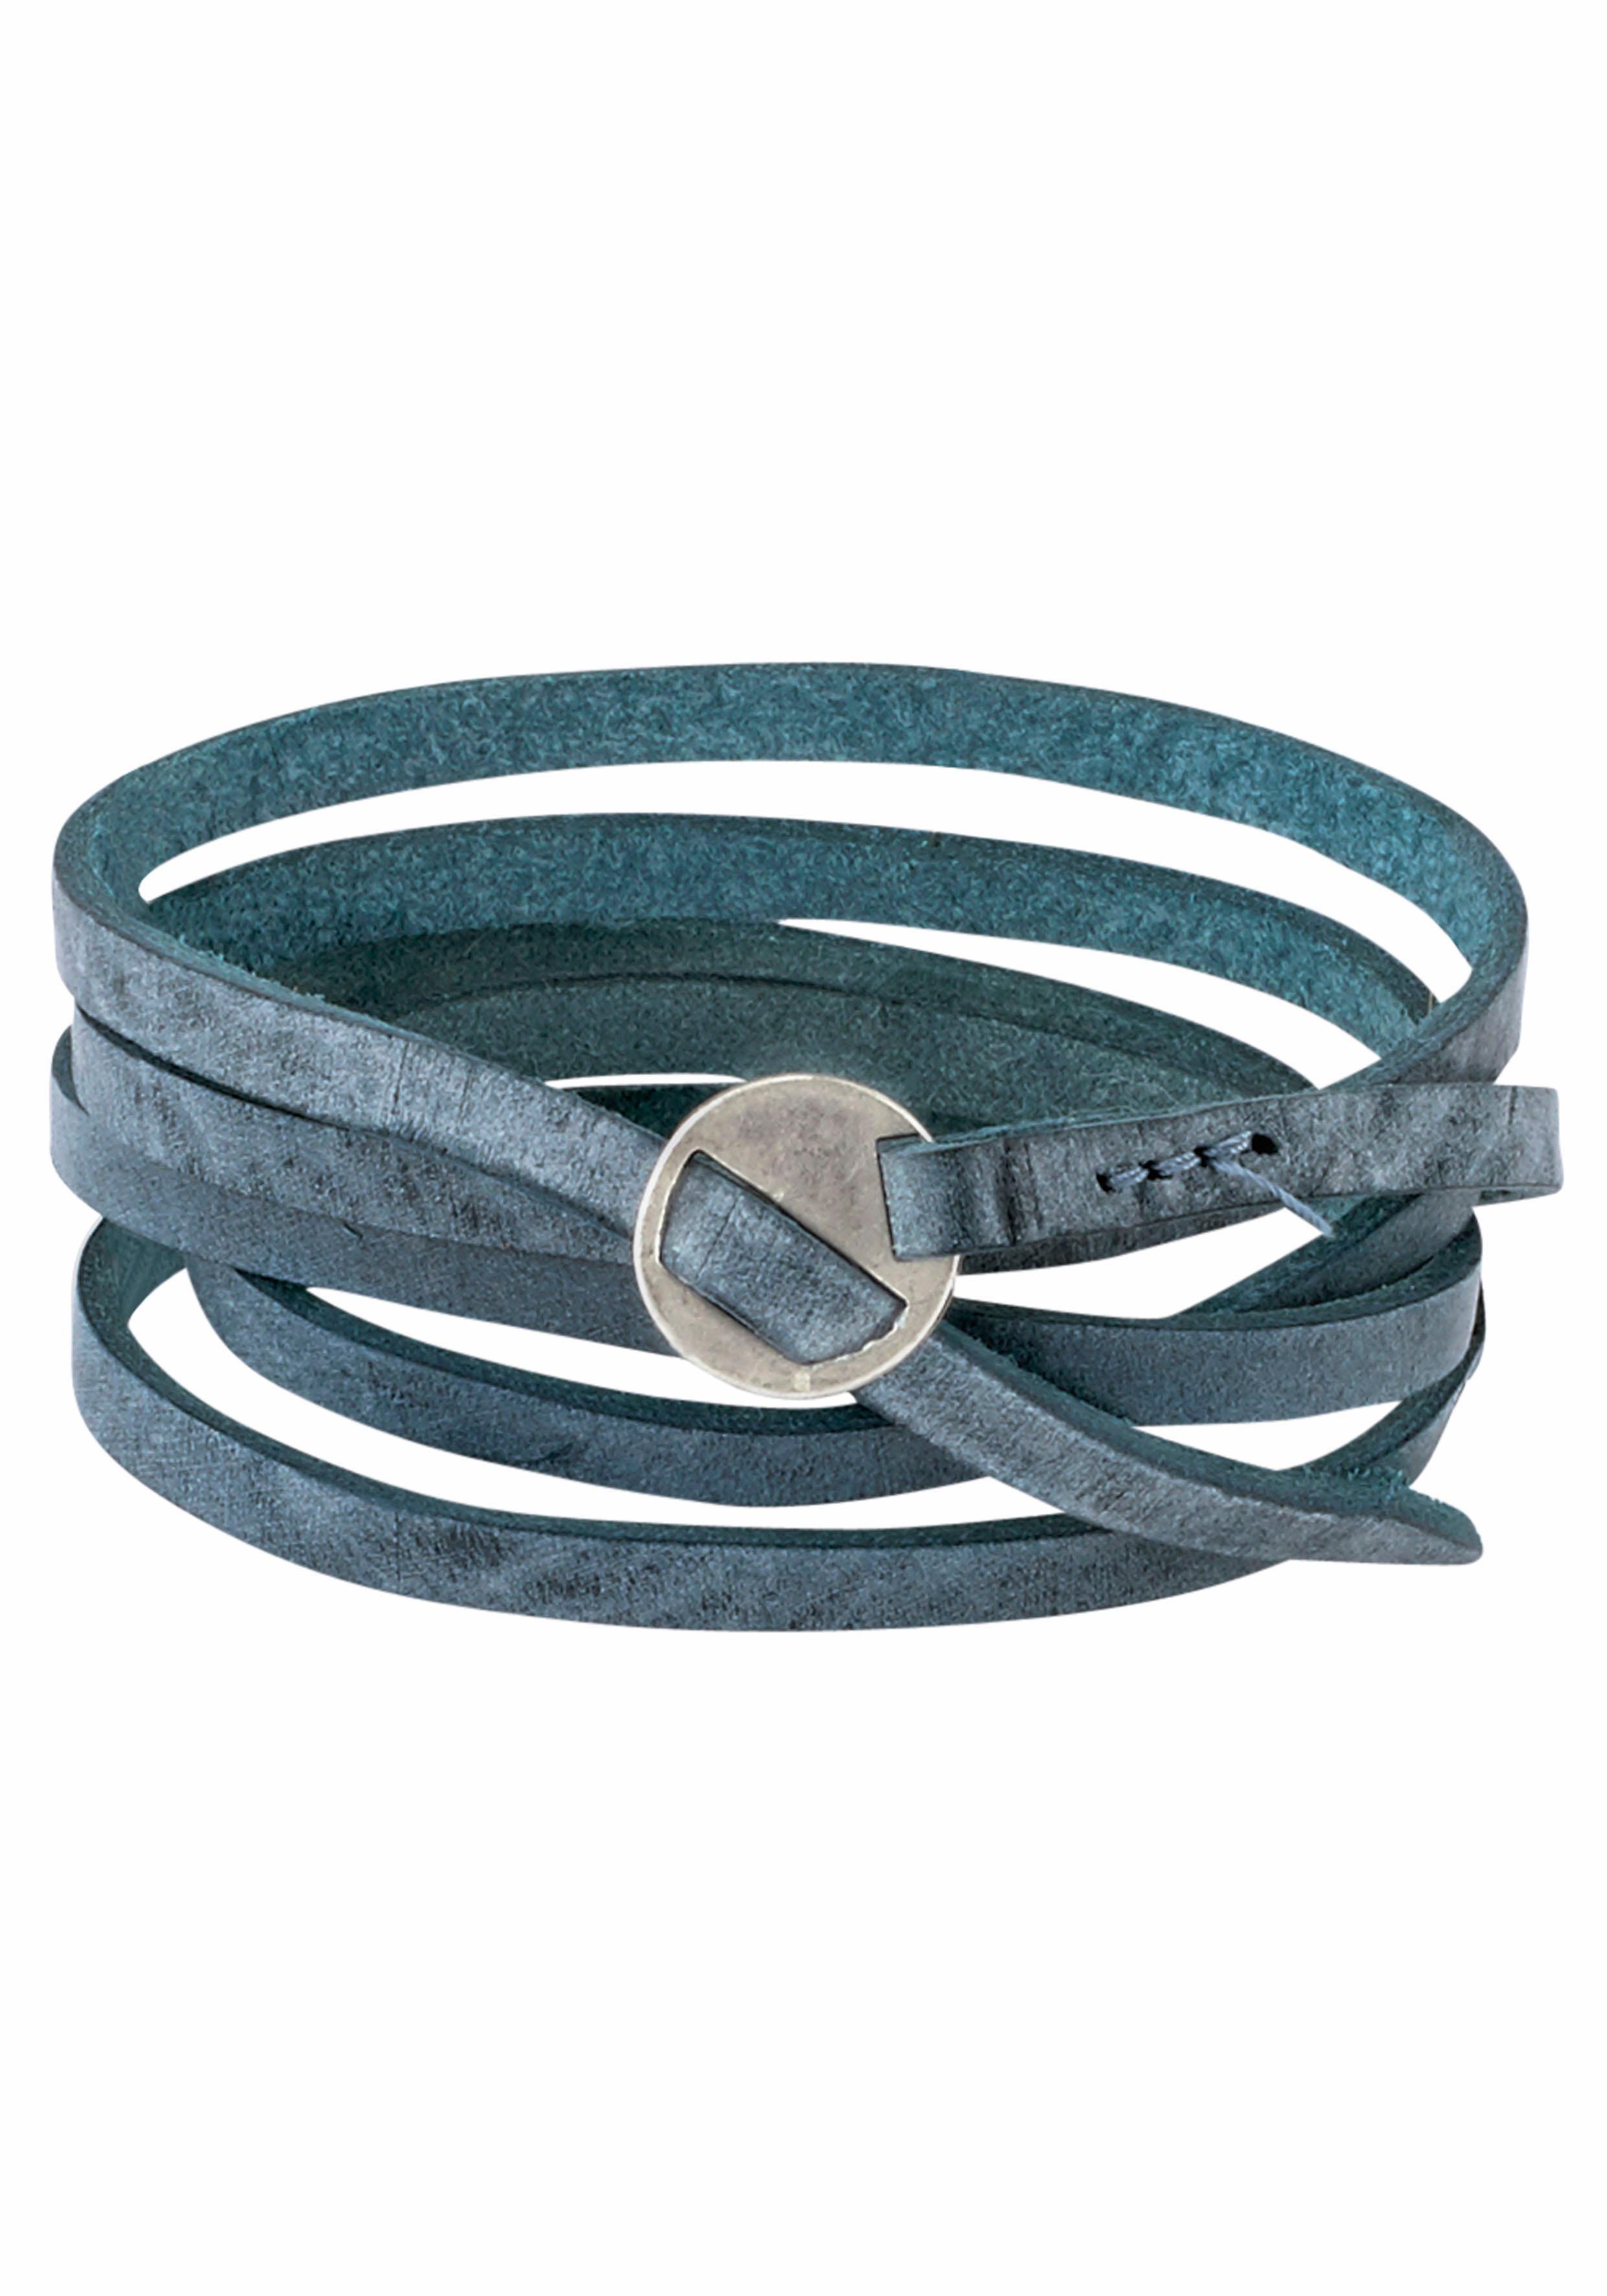 J.Jayz Lederarmband »zum Wickeln, mit trendiger Metallschließe« | Schmuck > Armbänder > Lederarmbänder | J.Jayz